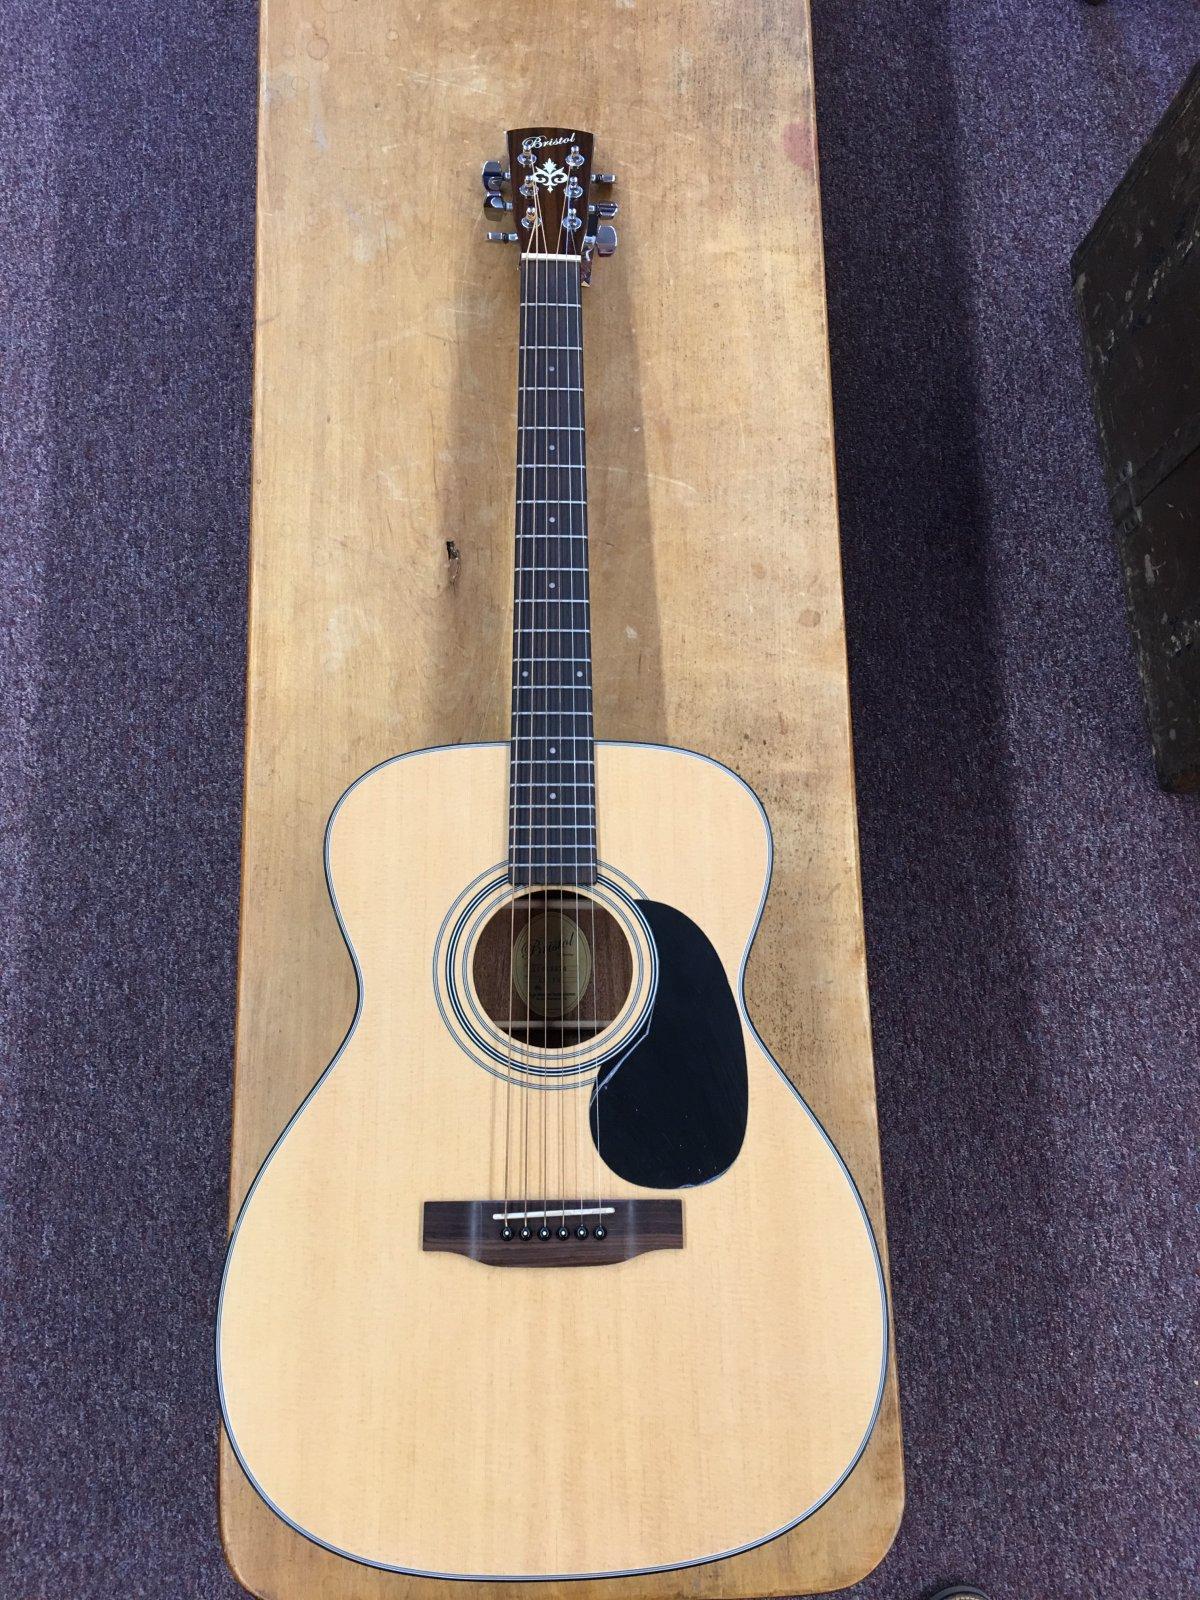 Bristol BM-16 000 Acoustic Guitar